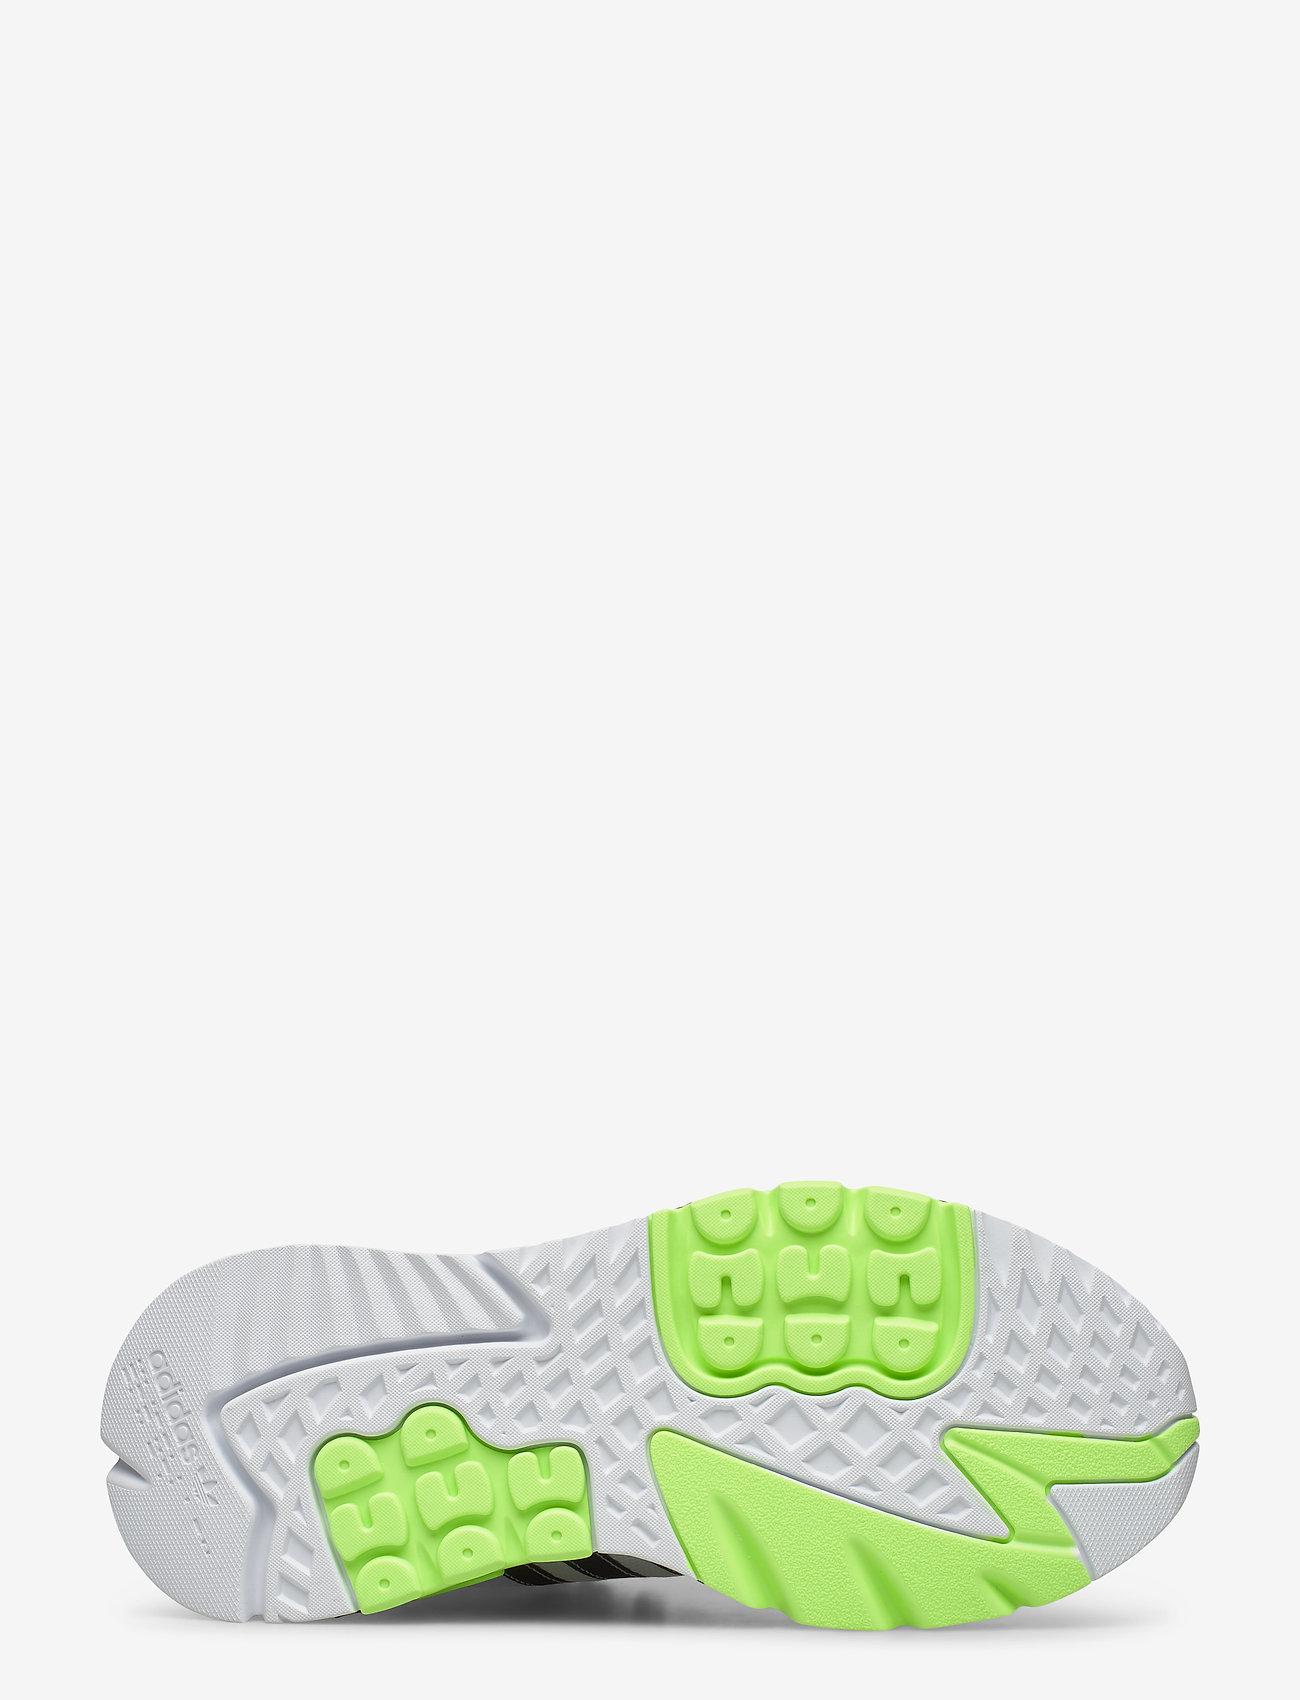 Nite Jogger (Ftwwht/cblack/siggnr) - adidas Originals